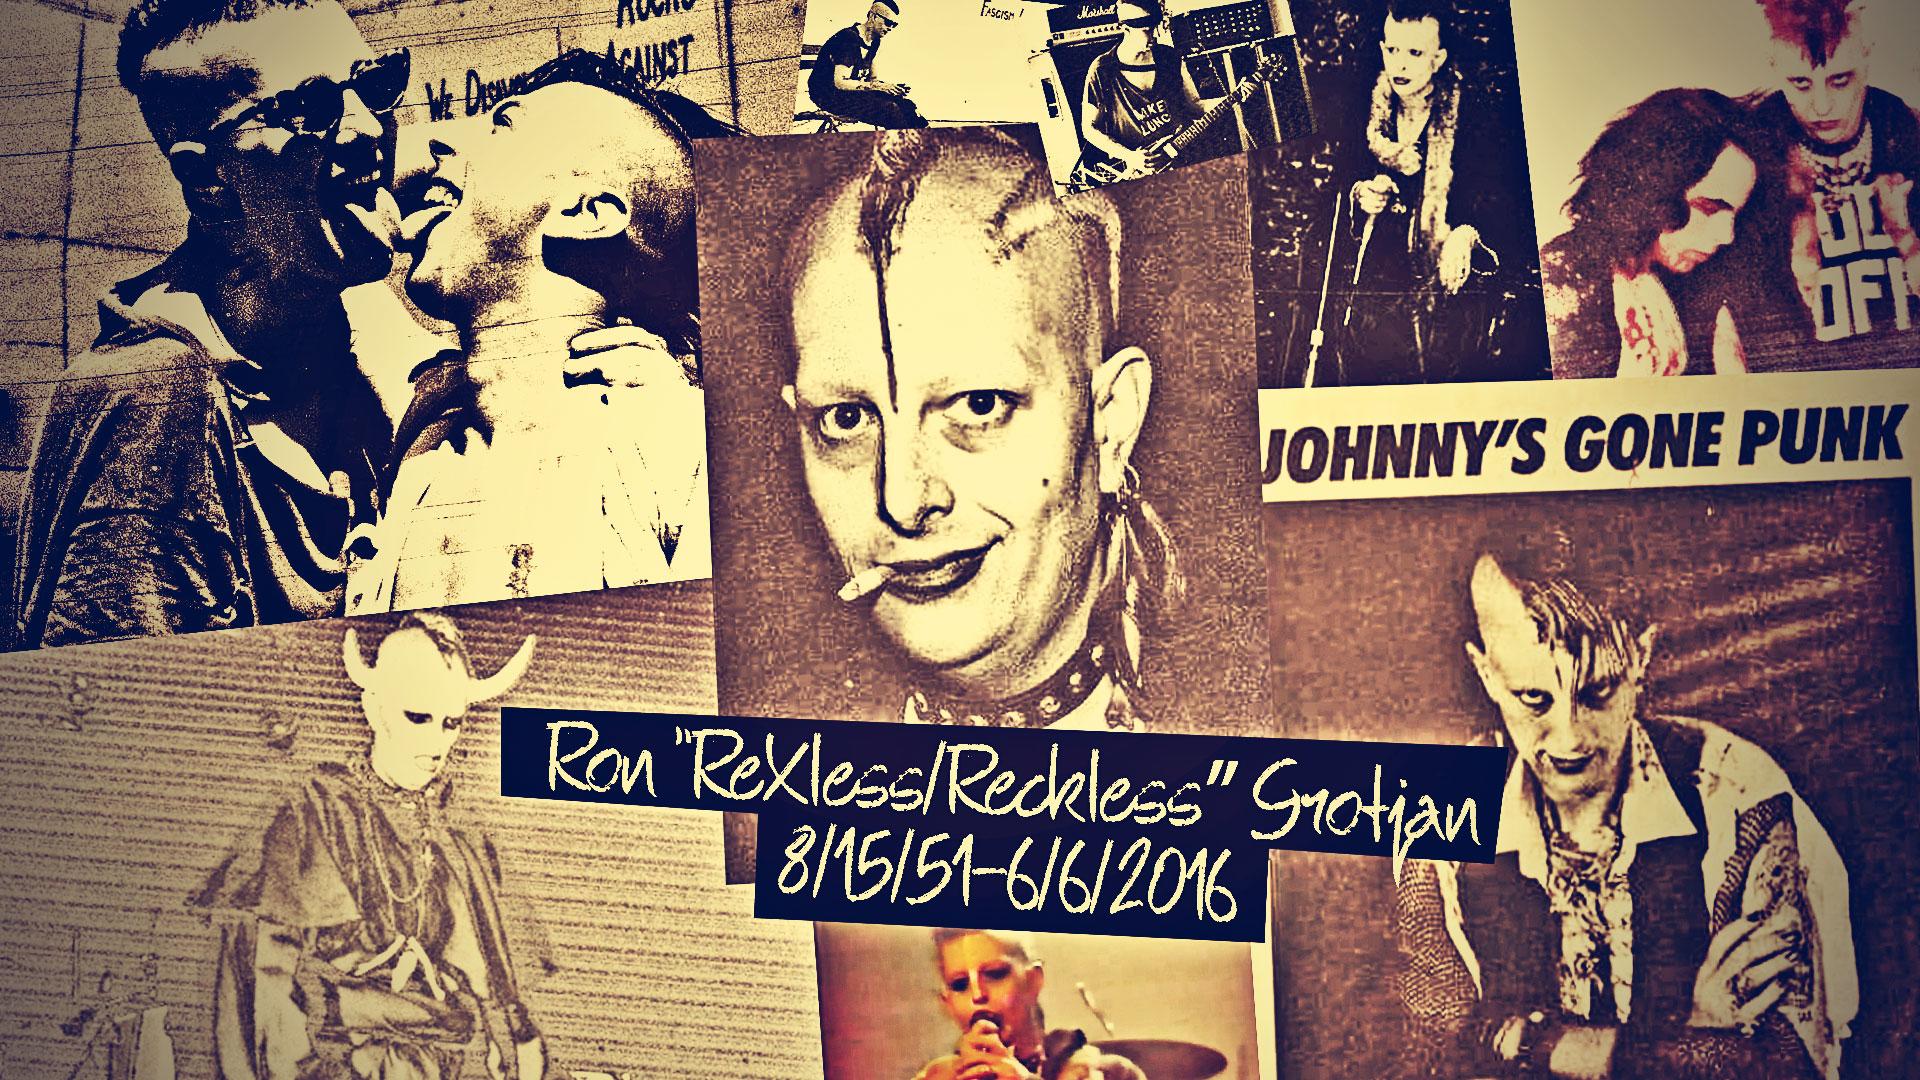 Ron 'ReXless/Reckless' Grotjan 8/15/51-6/6/2016